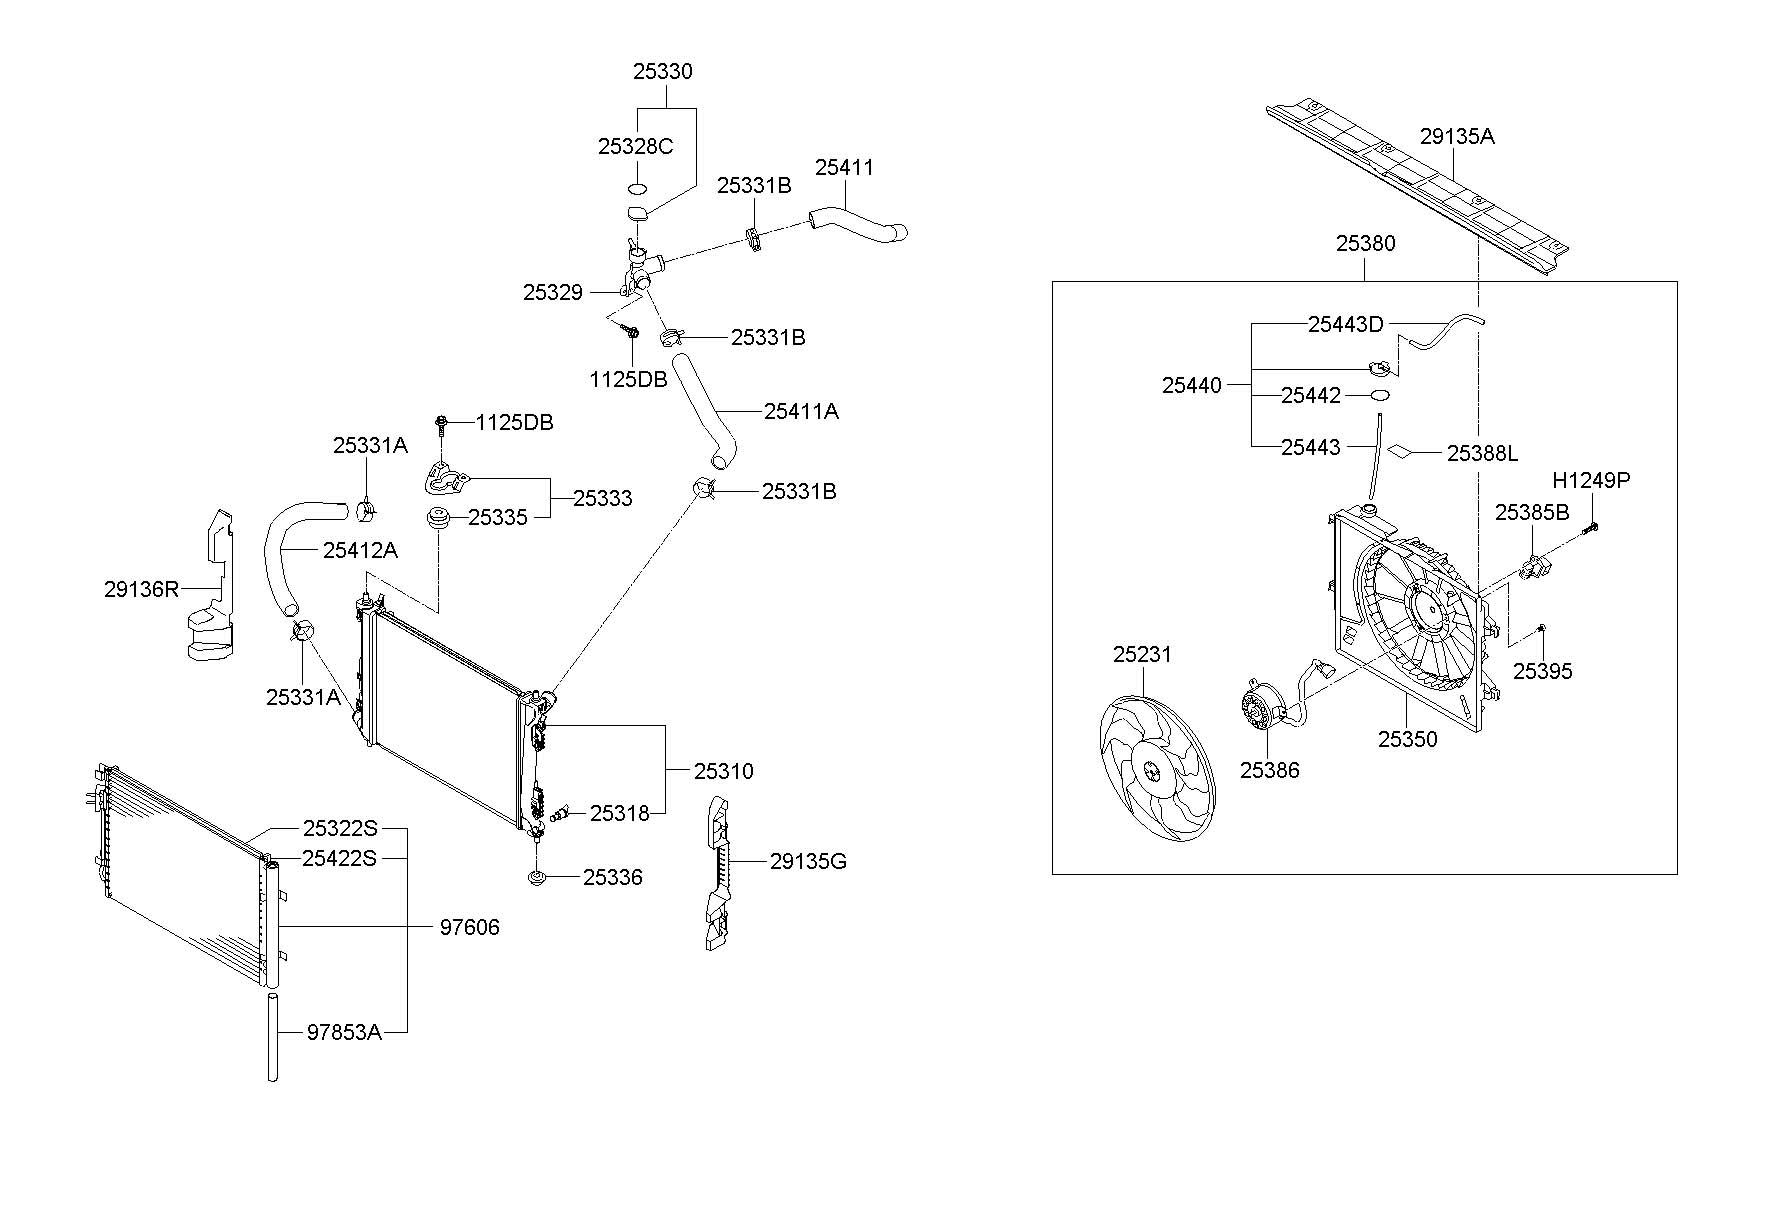 253362v000 - Hyundai Insulator